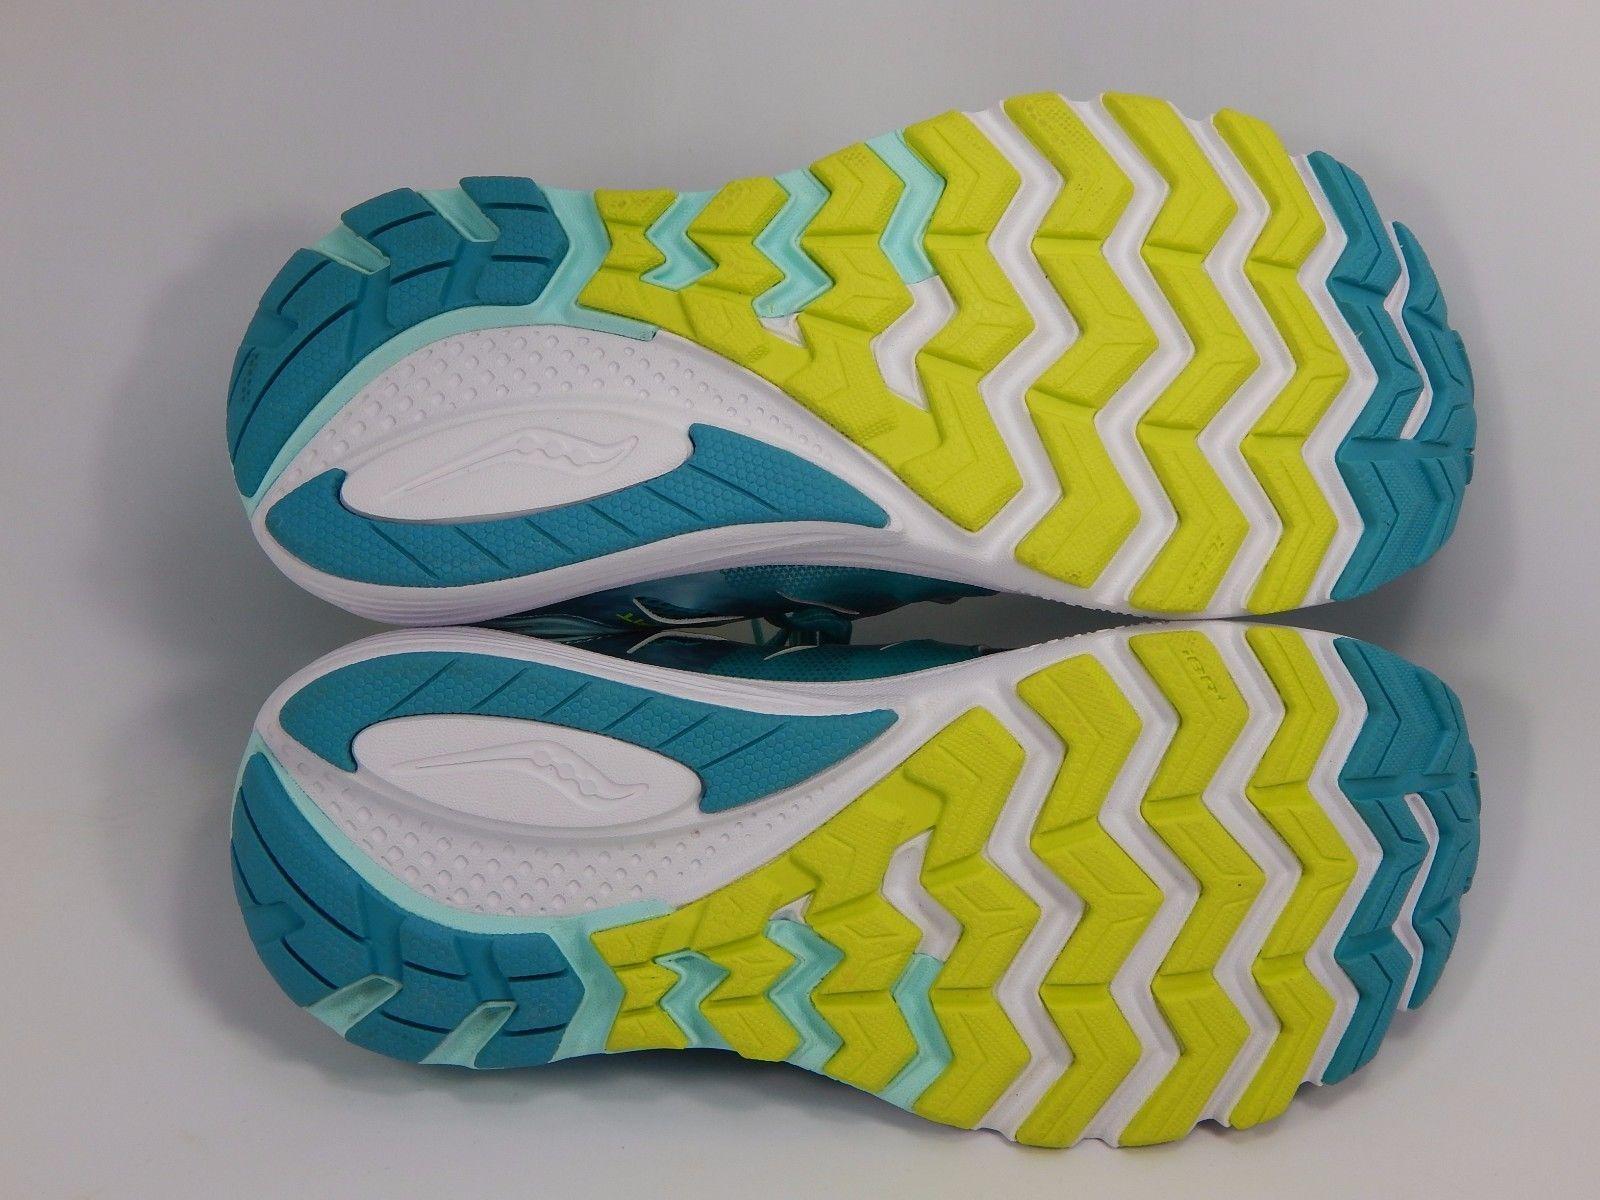 Saucony Zealot ISO 2 Women's Running Shoes Size US 8 M (B) EU 39 Green S10314-4